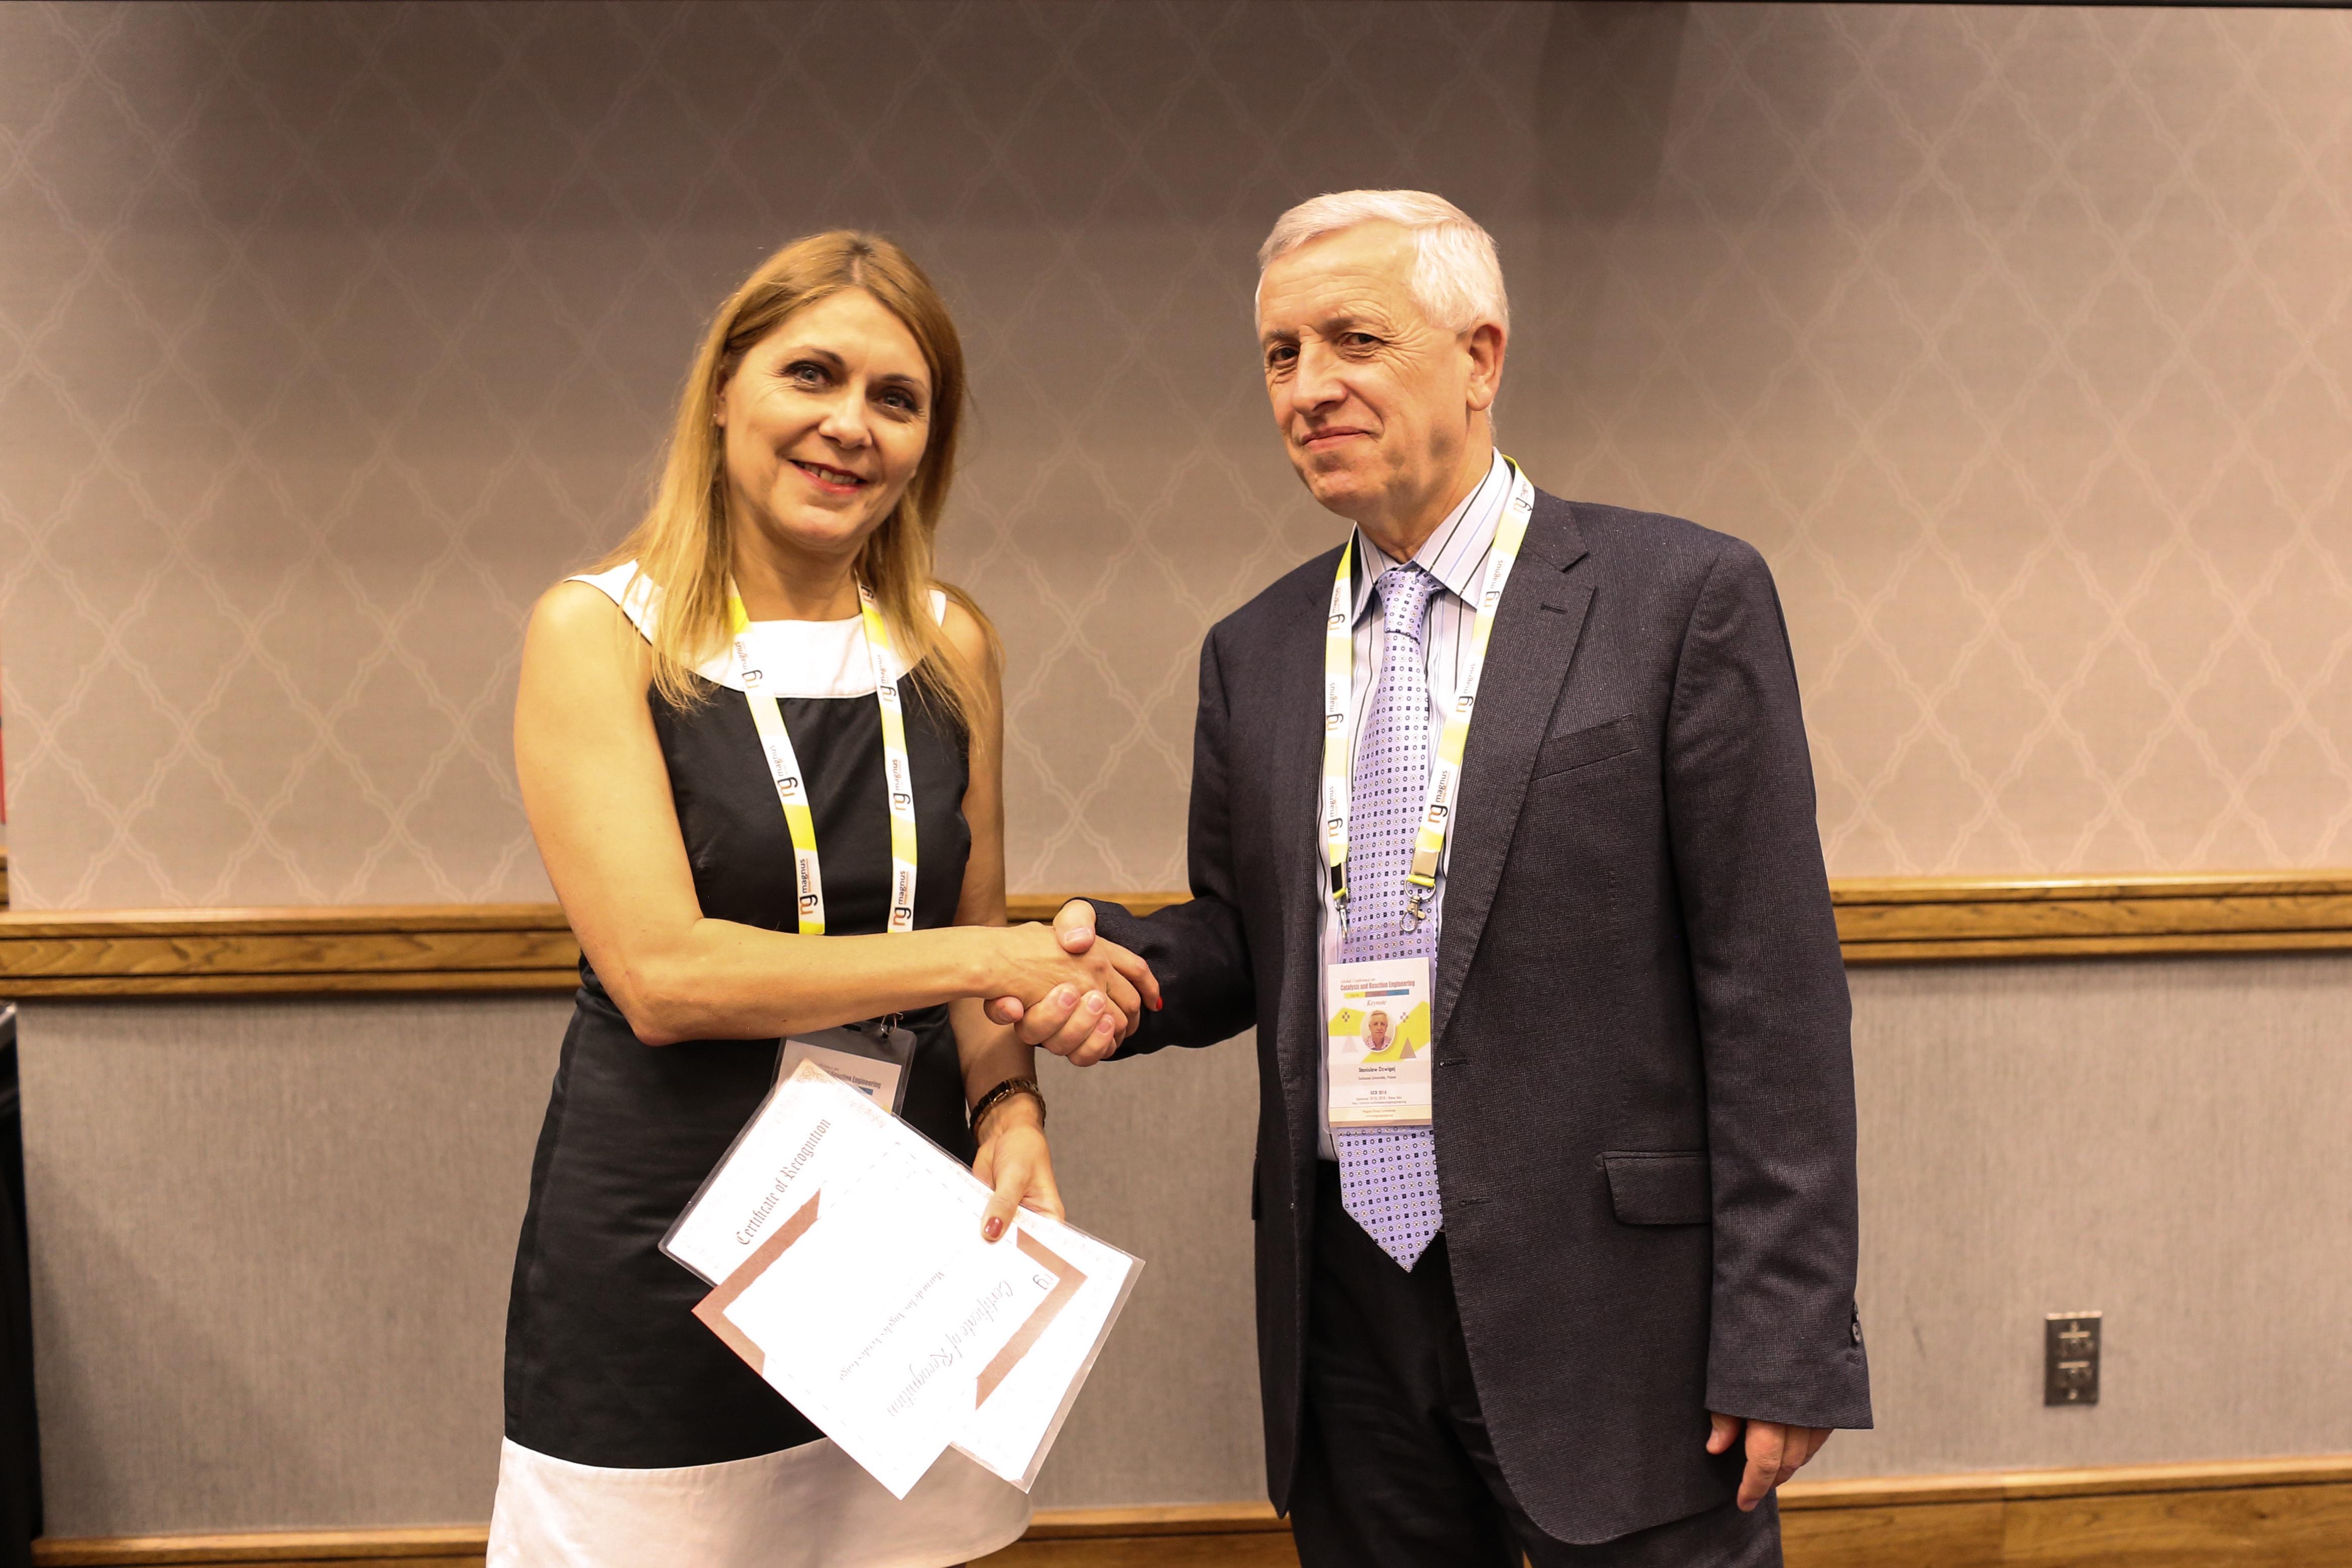 Maria de los Angeles Verdes Gago felicitated by Stanislaw Dzwigaj